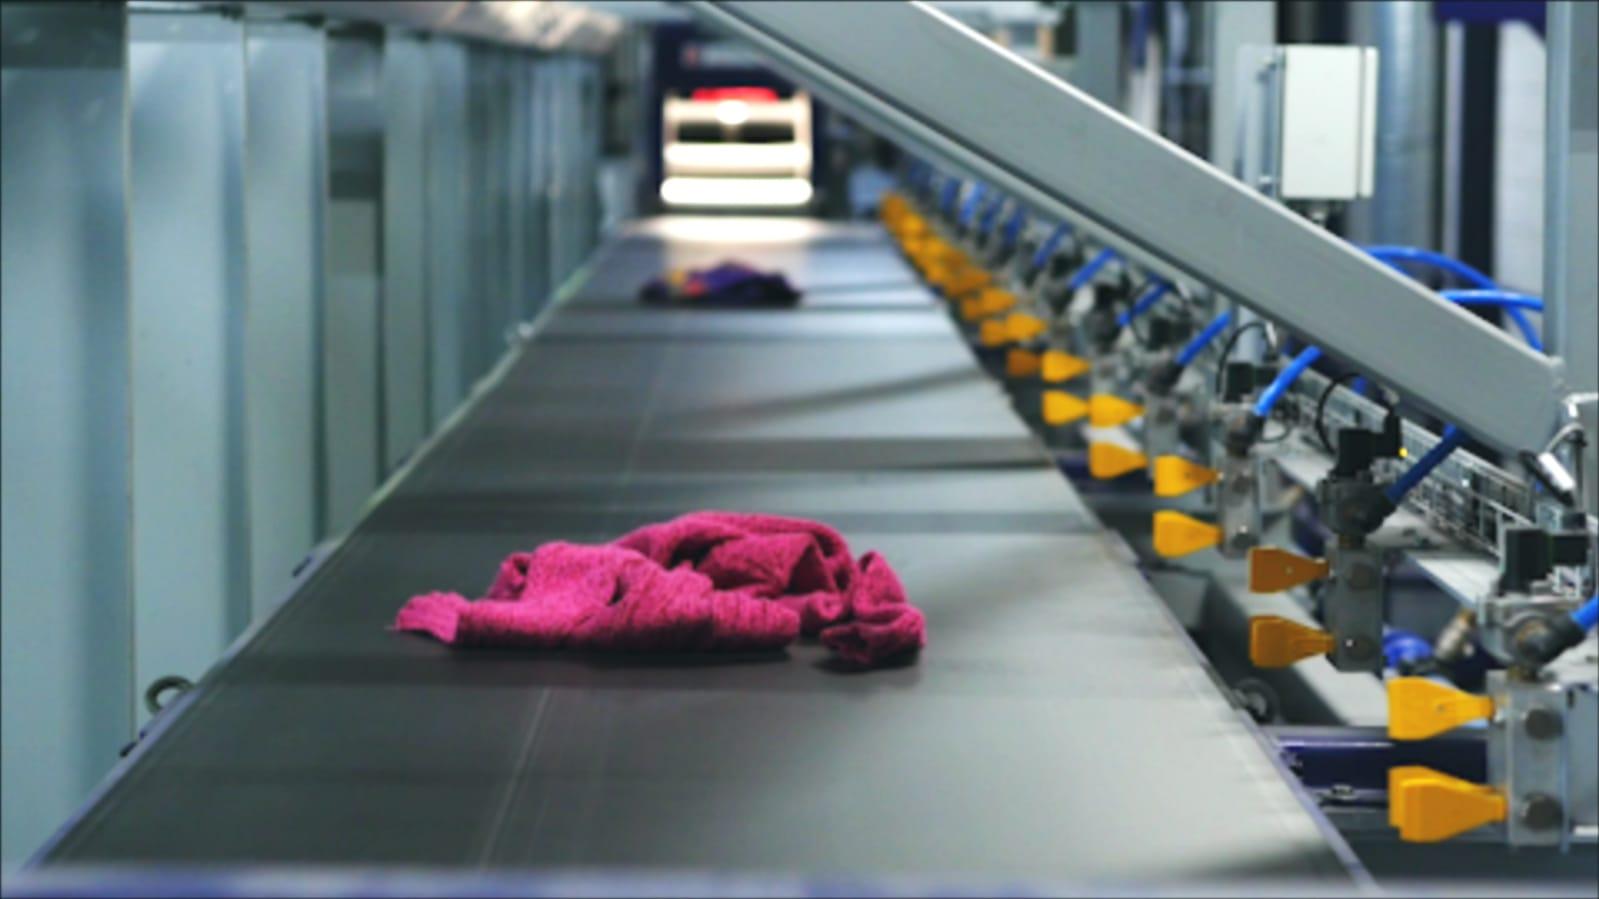 Resultaten enquêteimpact COVID-19 crisis op textielrecycling